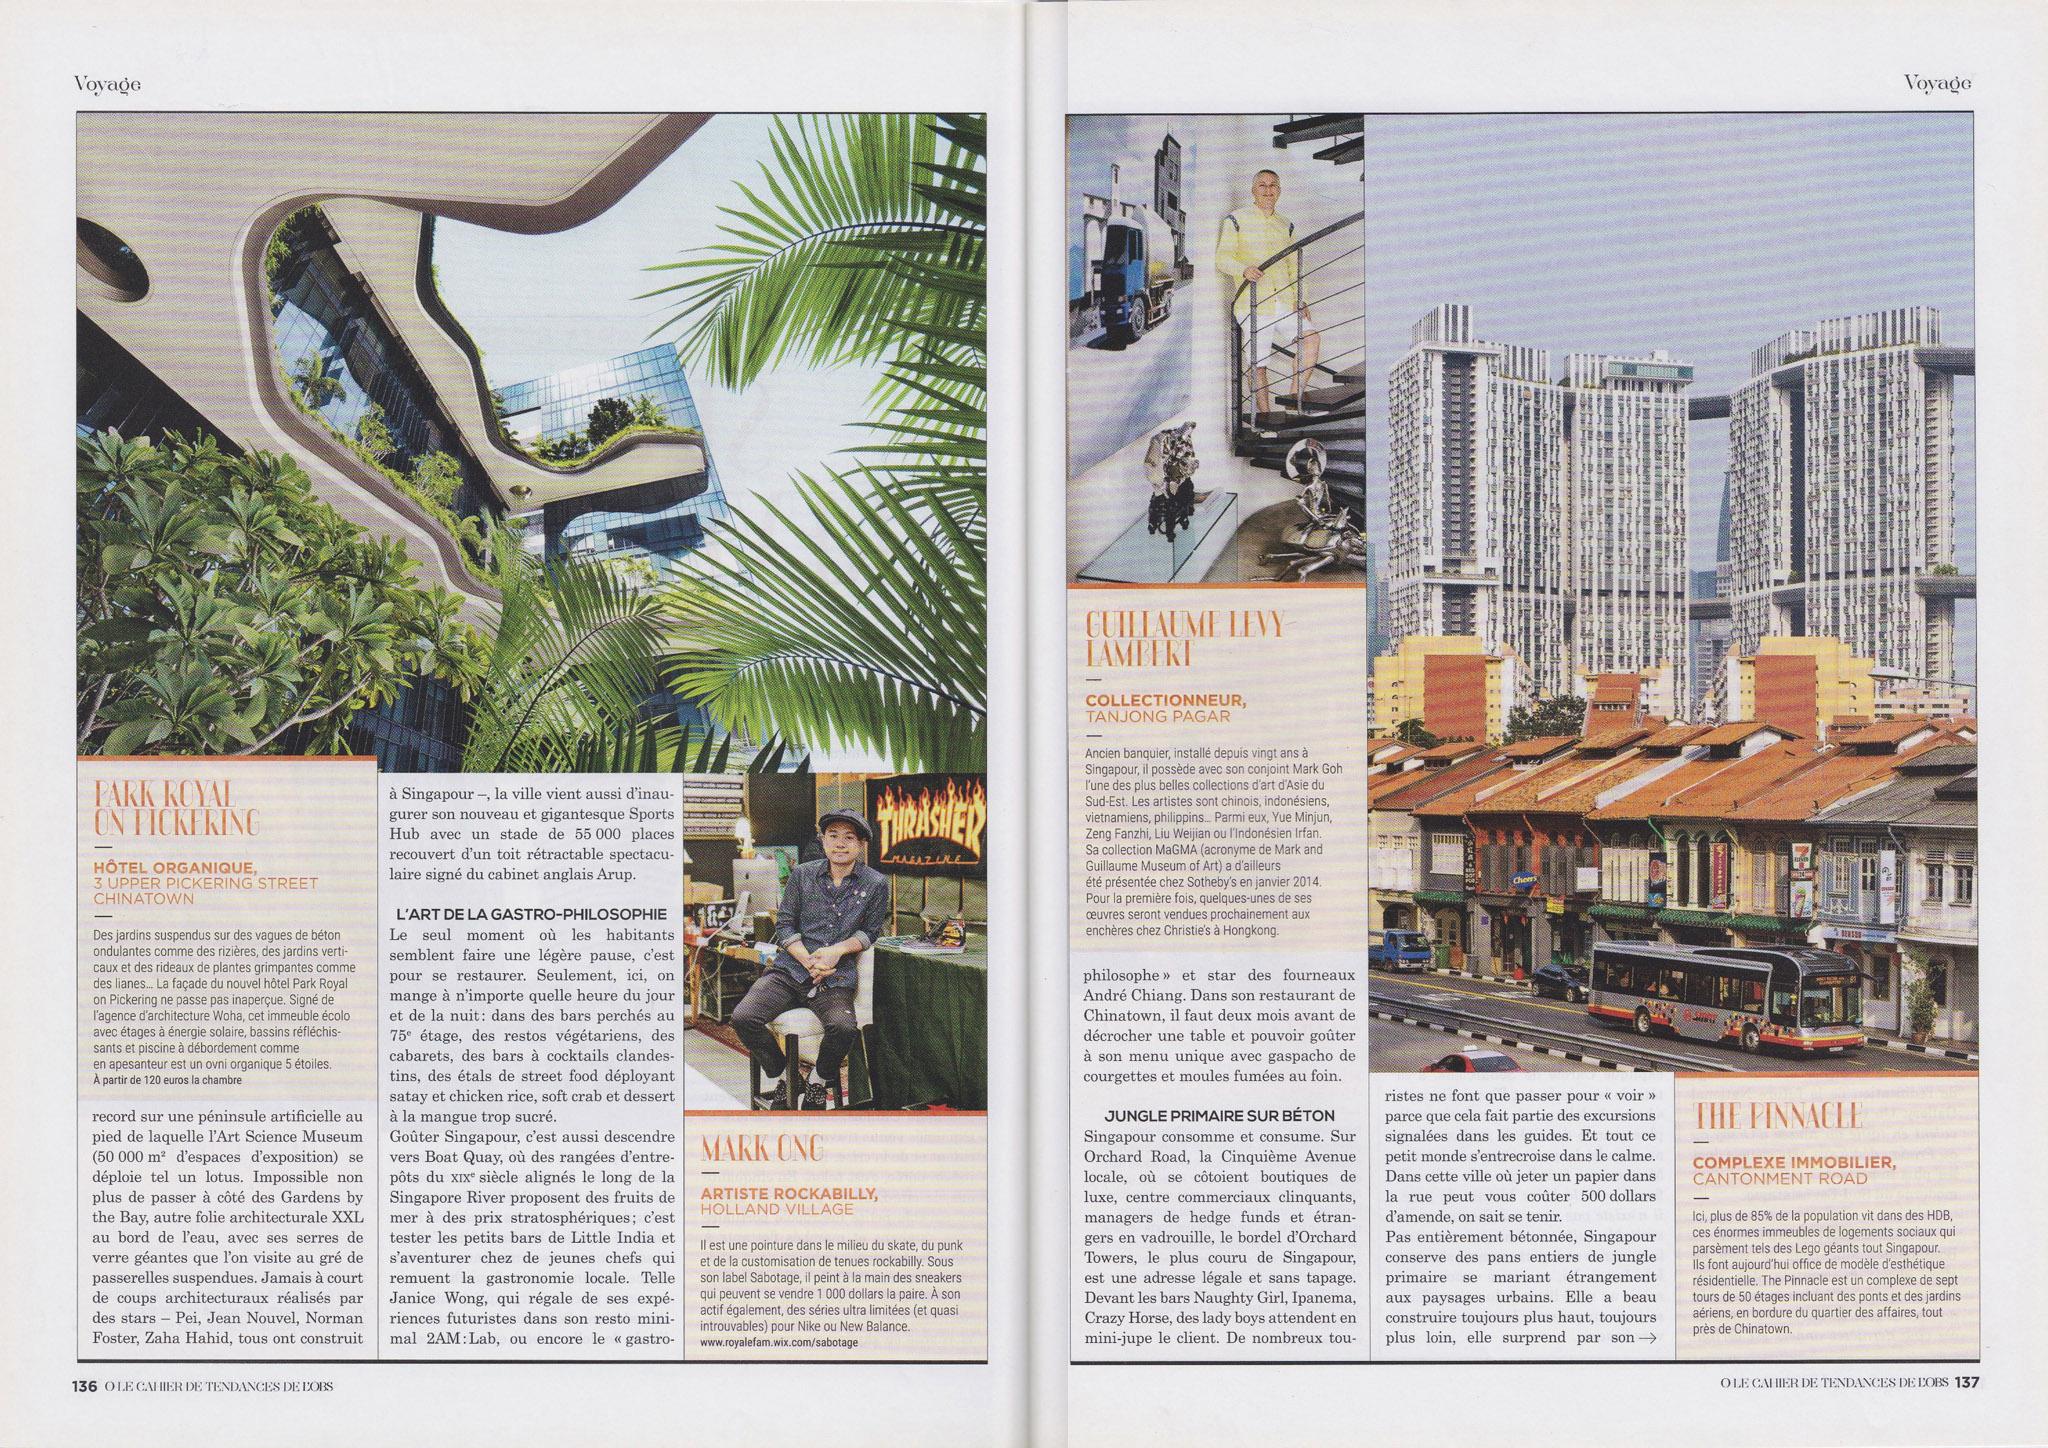 015O-2-singapore-photographer-editorial-commercial-5_20.jpg